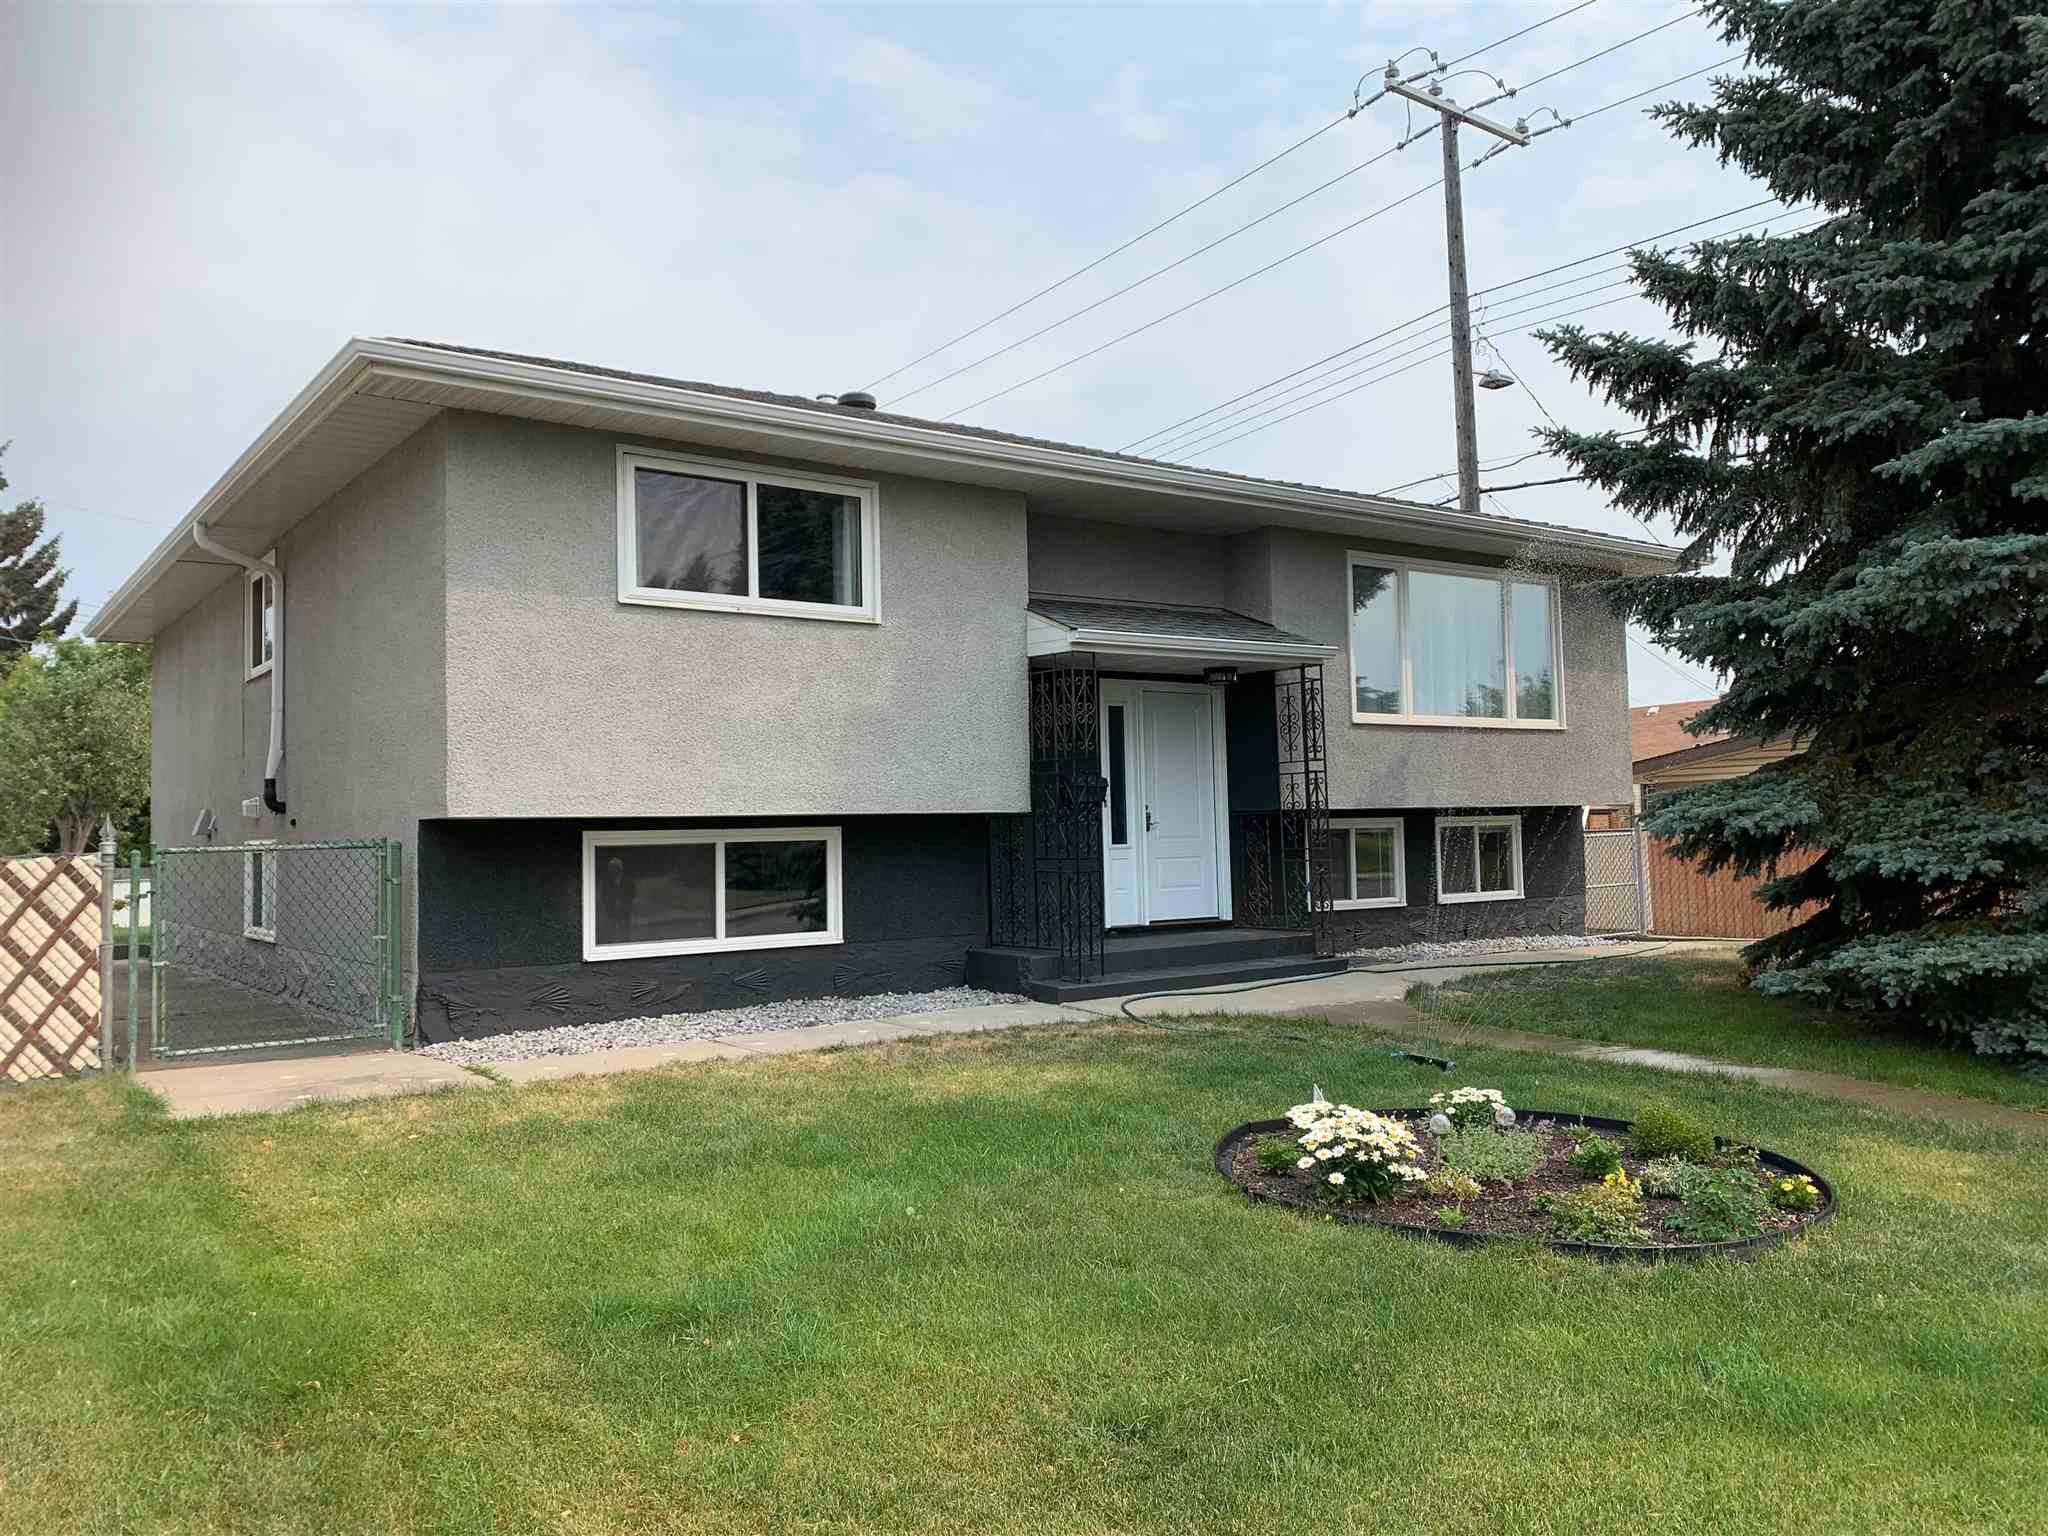 Main Photo: 7312 86 Avenue in Edmonton: Zone 18 House for sale : MLS®# E4248681